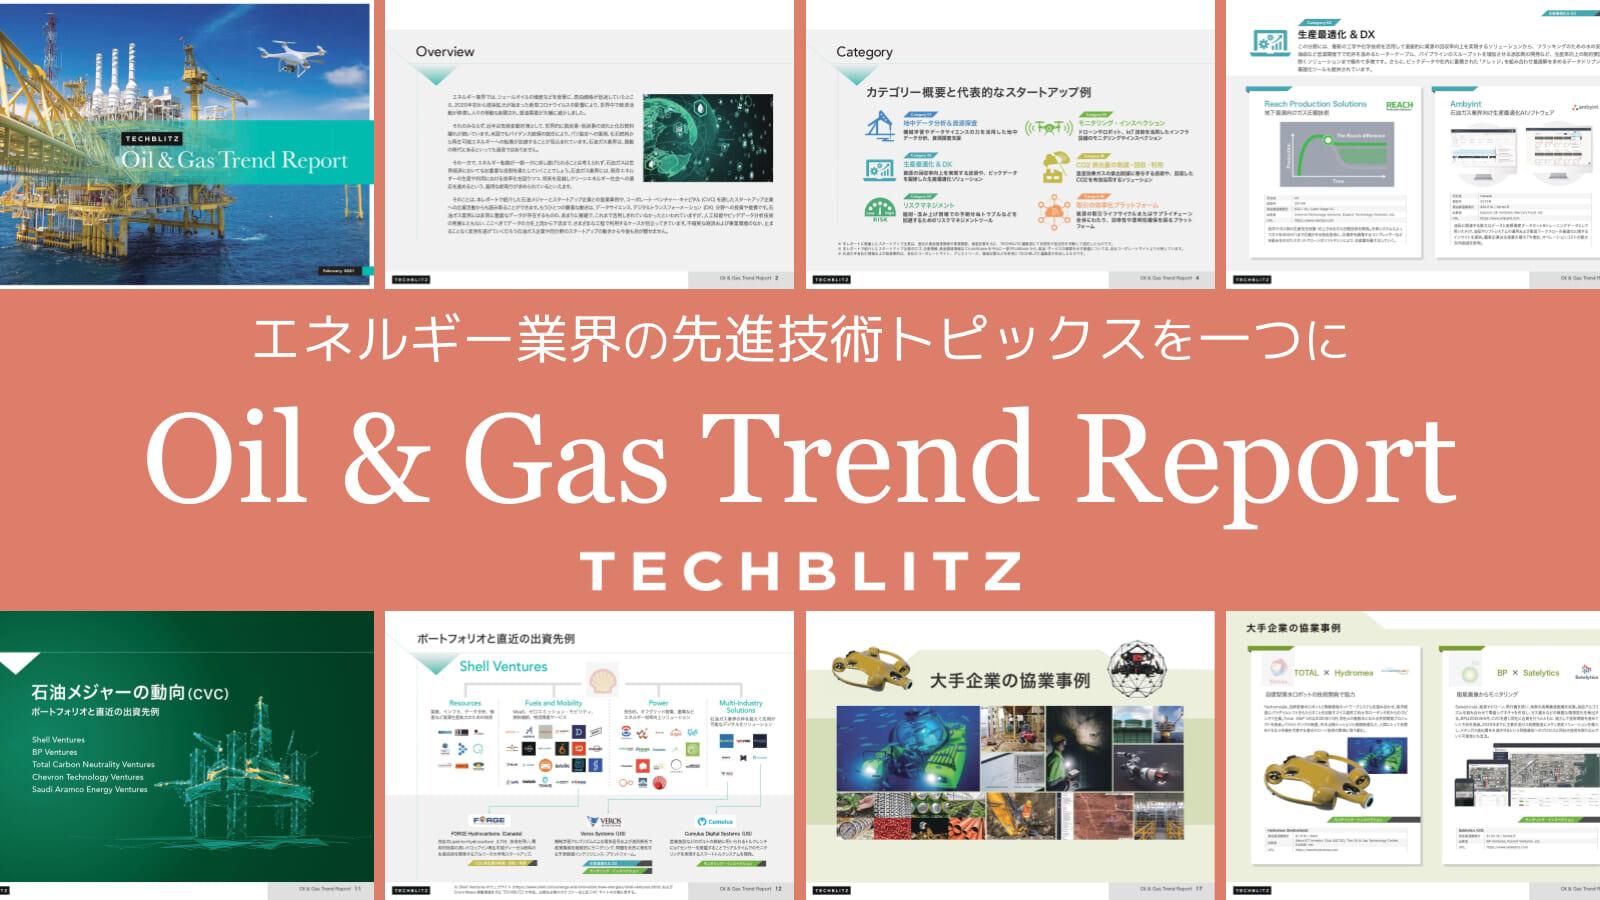 「Oil & Gas Trend Report」発行 エネルギー業界の動向を一括把握